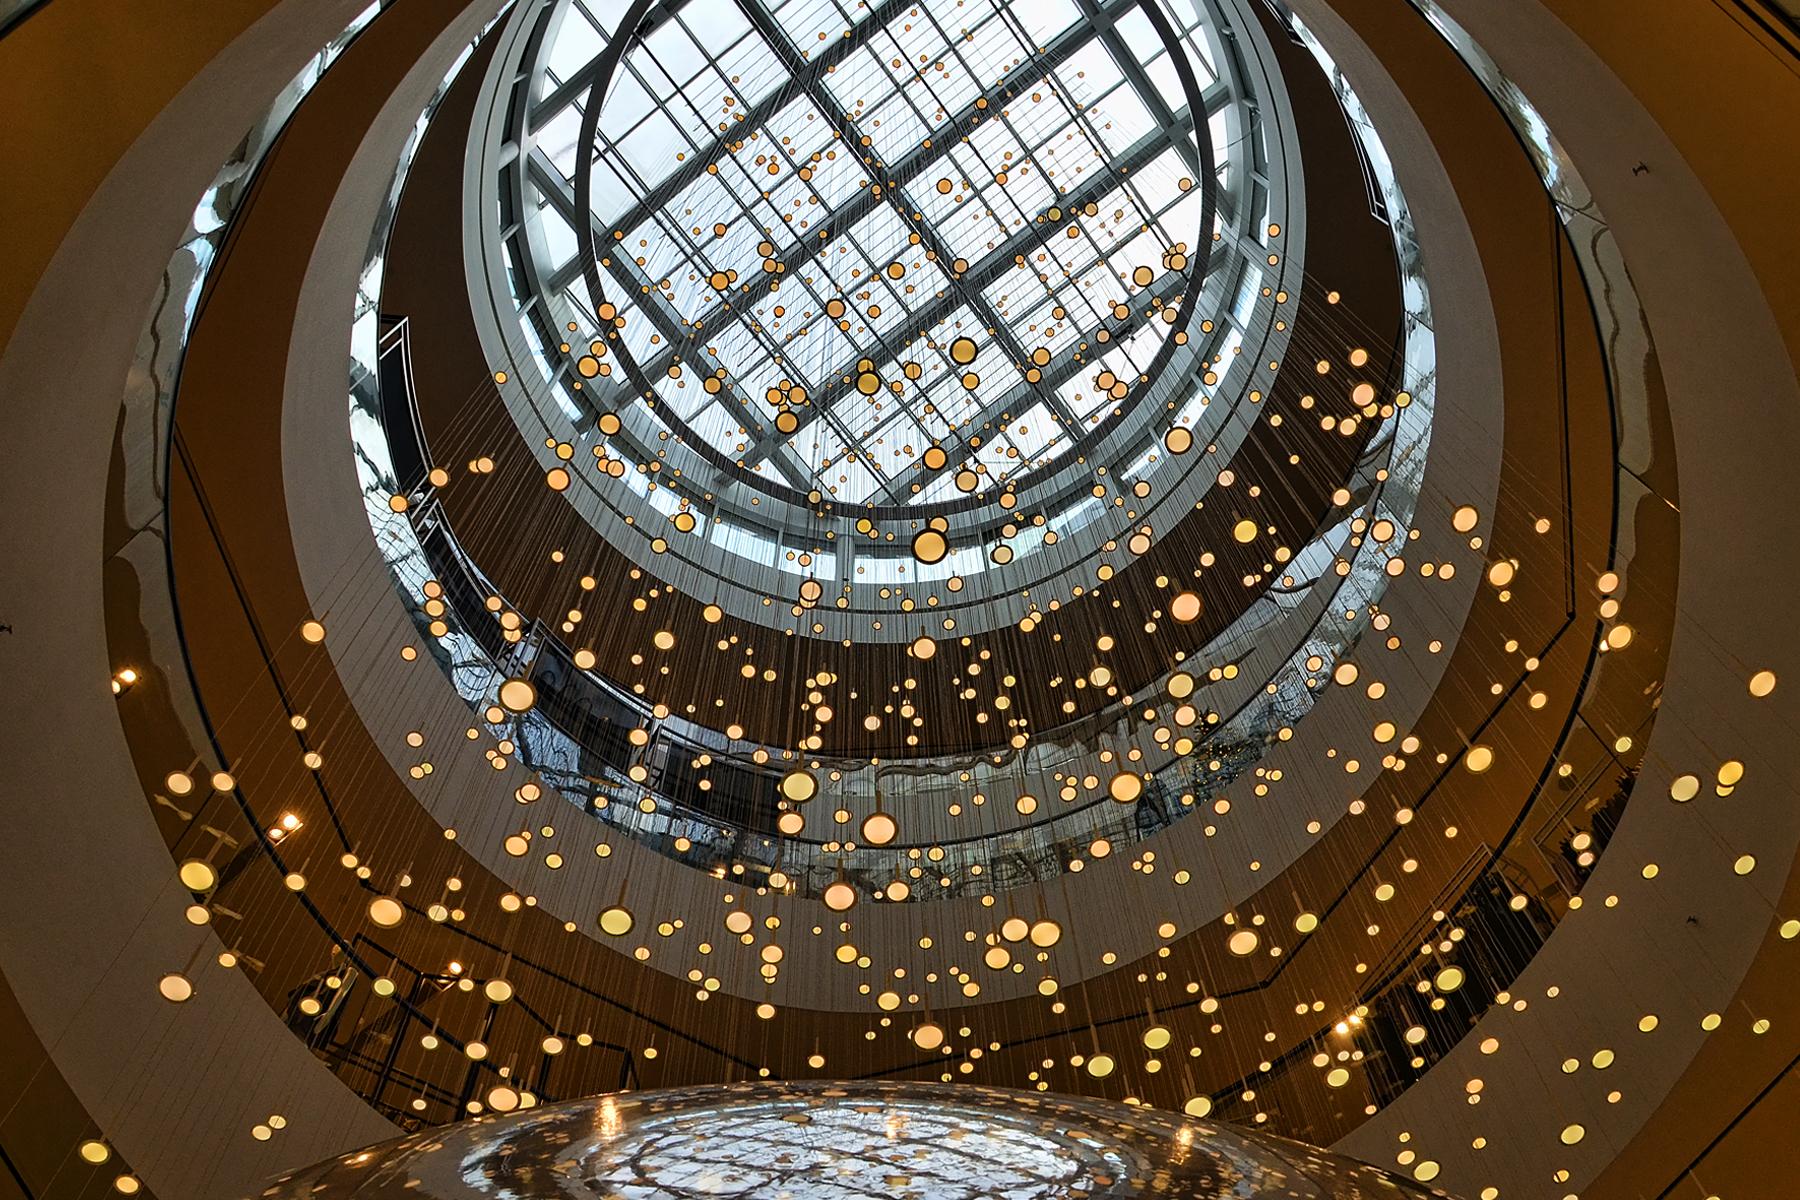 Amazing Shing Lights Diy Decorating Ideas